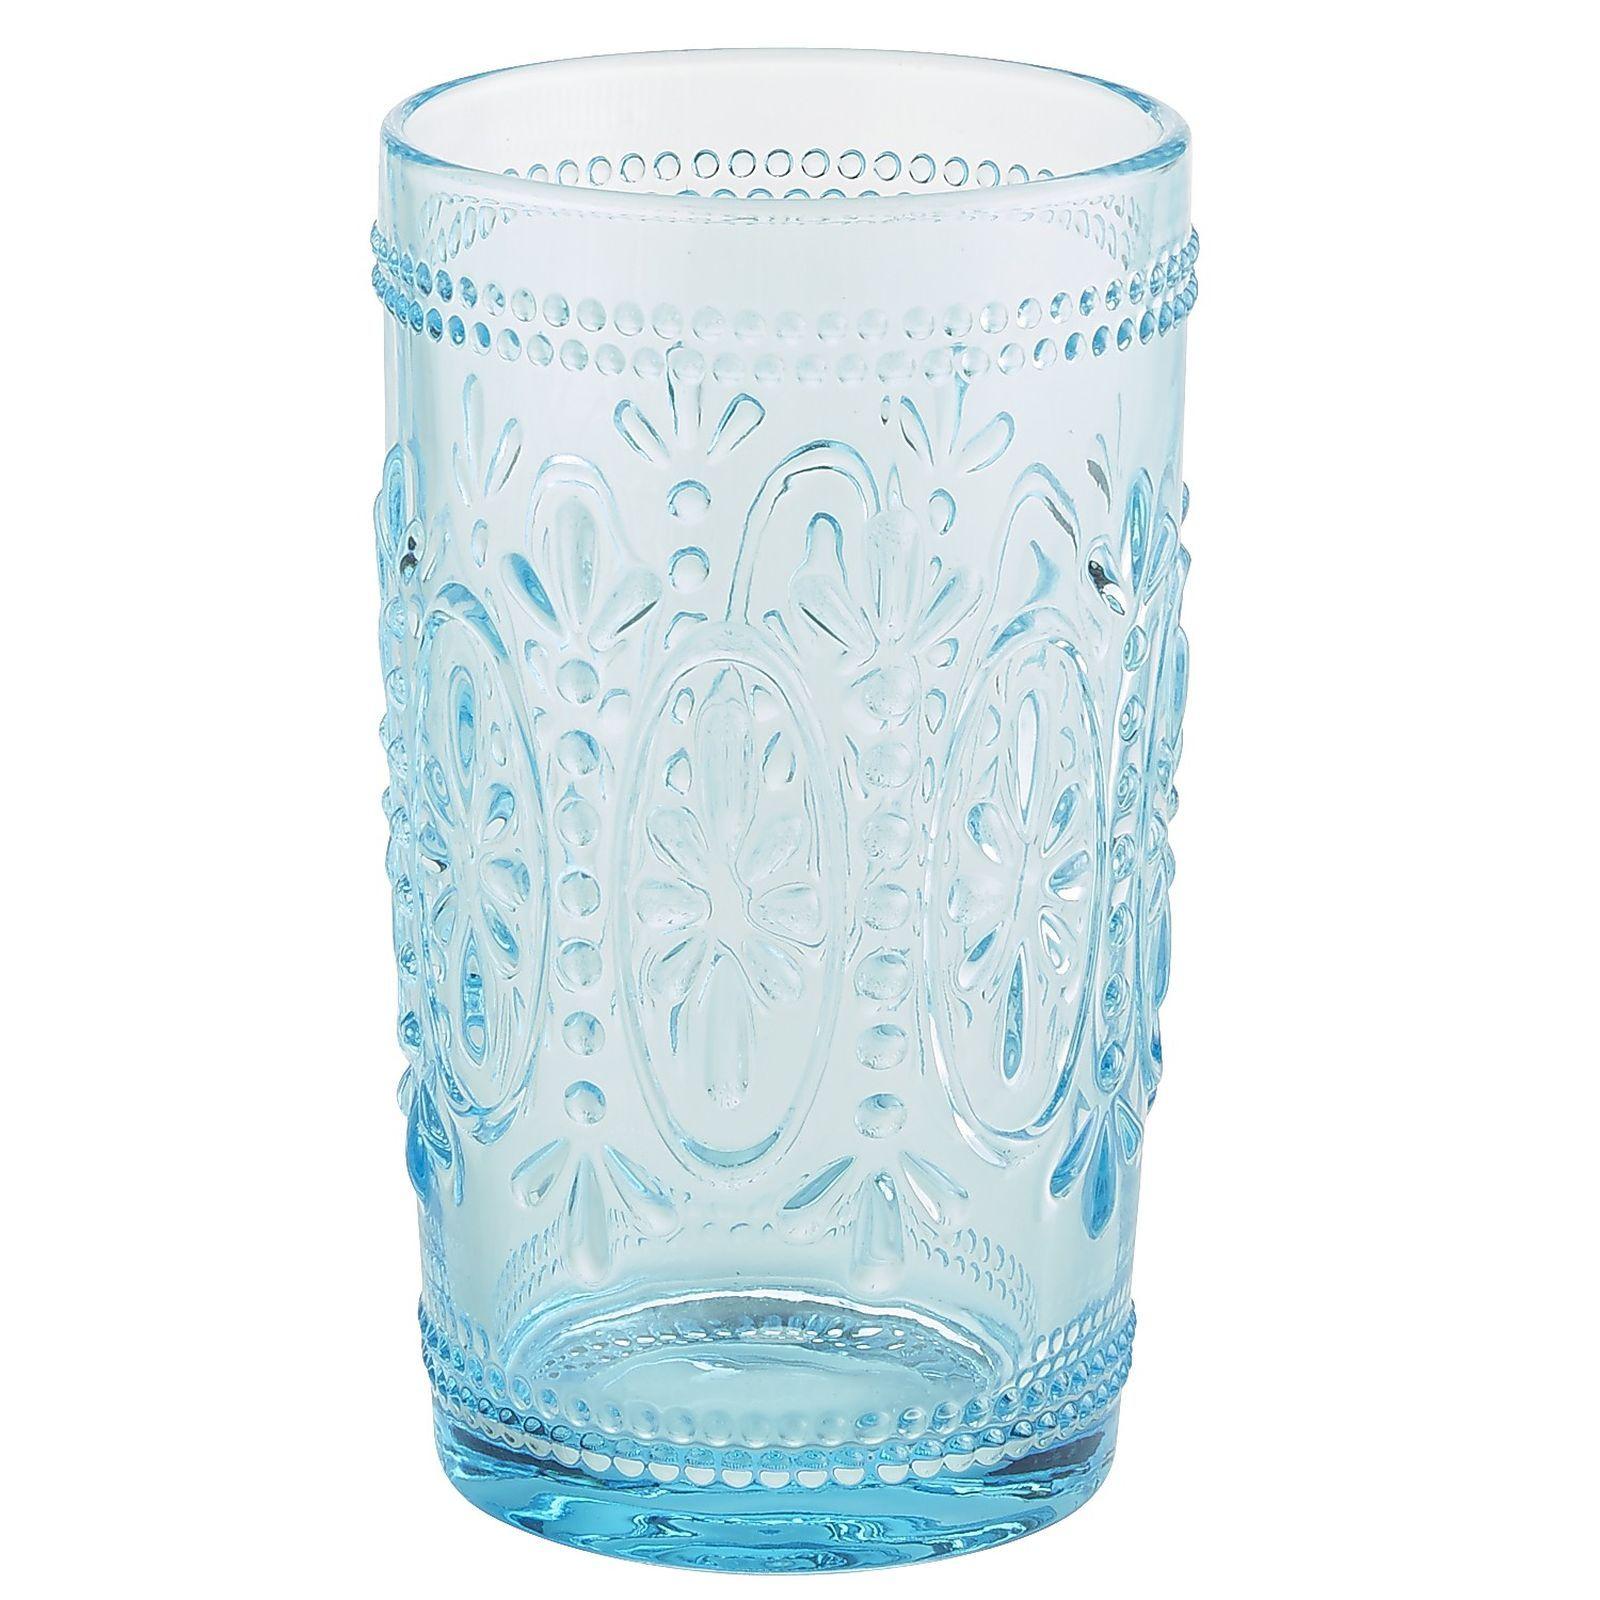 Libbey 2392 Perception 9 oz Rocks Glass w// Signature Party Picks SET of 6